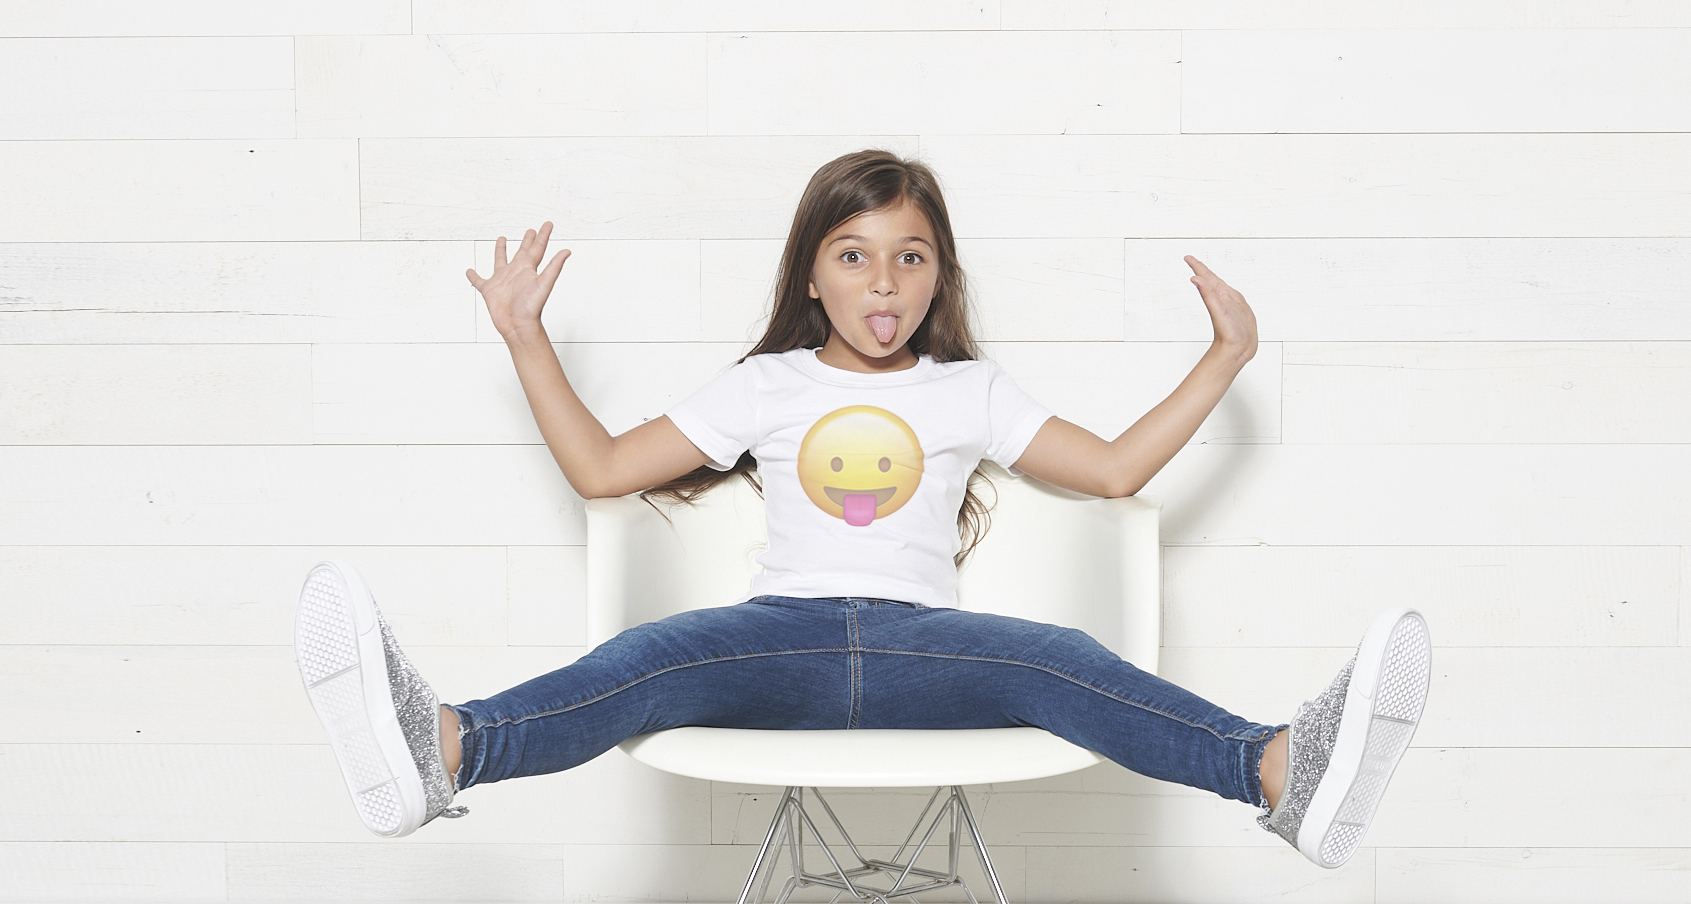 Basic_Shirt_White_Zara_Chair_Shiplap_Wall_2969_WEB.jpg